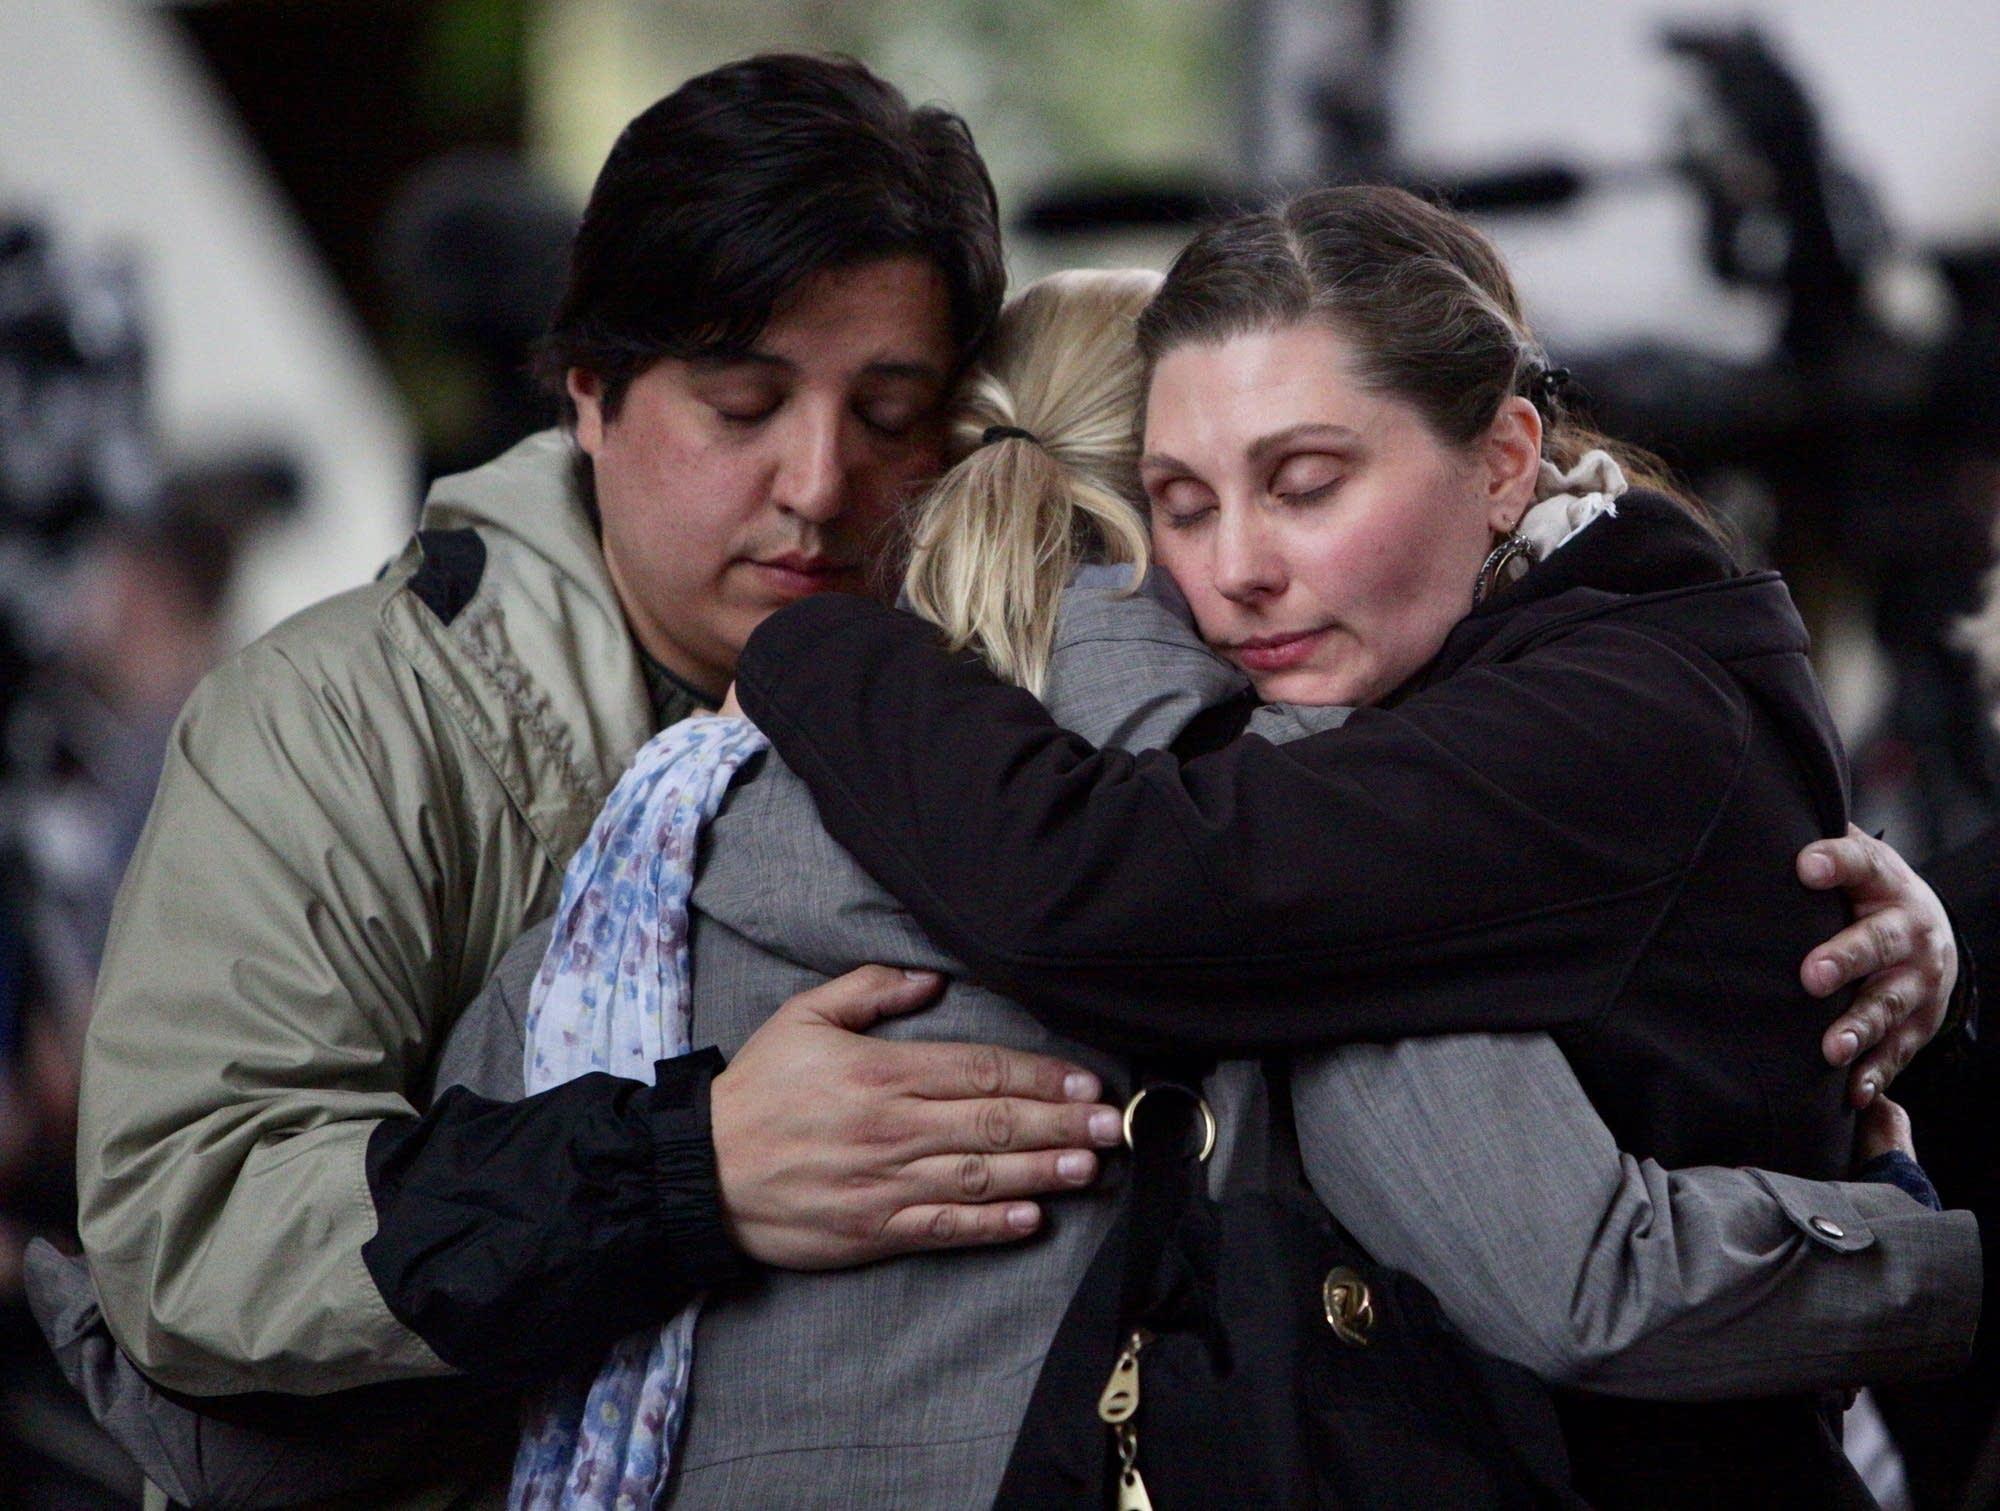 Crowd members hug after a verdict in the Noor trial